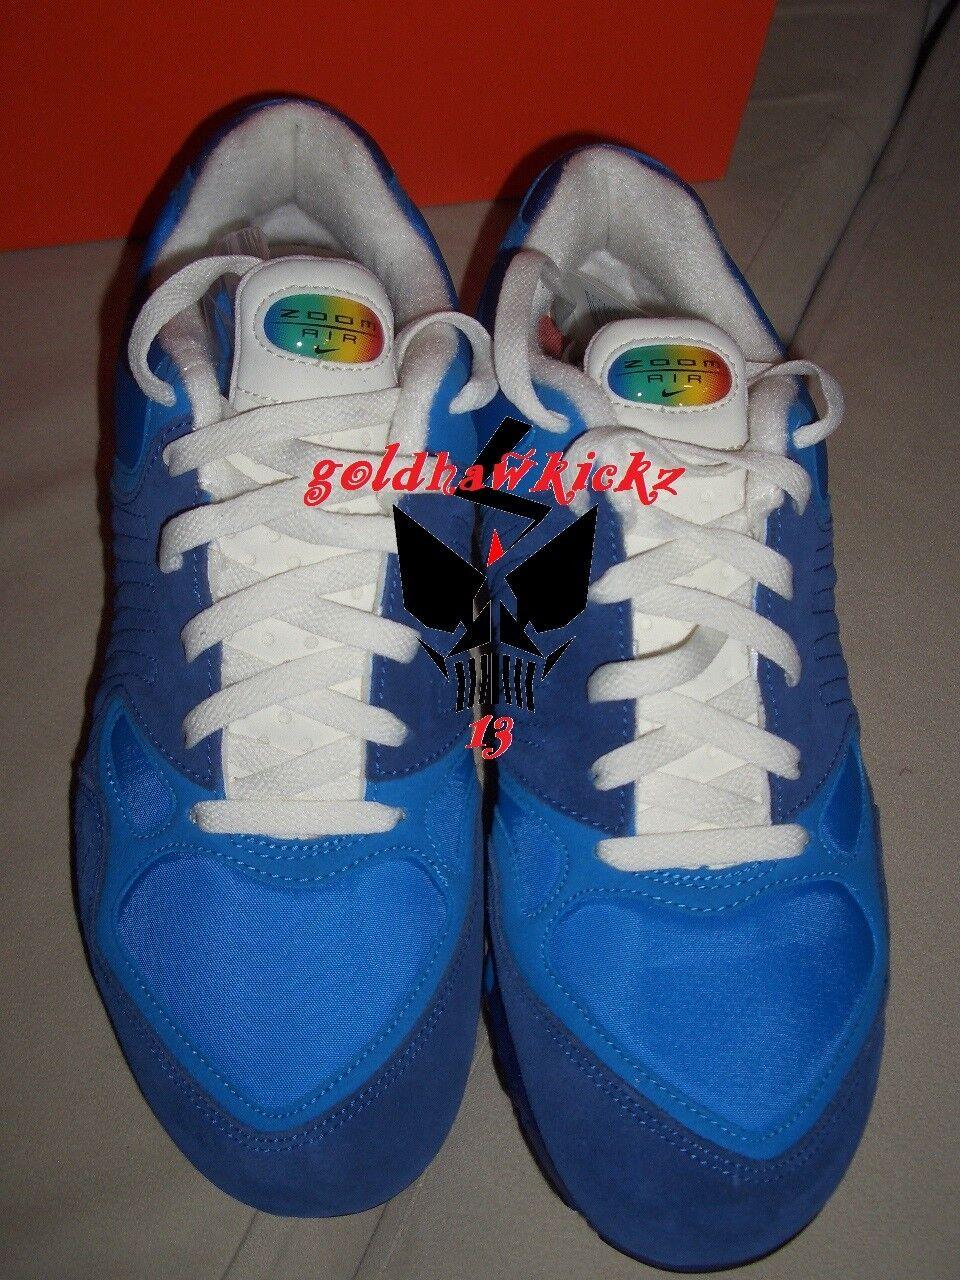 Nike Nike Nike zoom talaria 16 844695 401 SOAR VIVID SULFUR bluee rainbow nikelab 63a18a